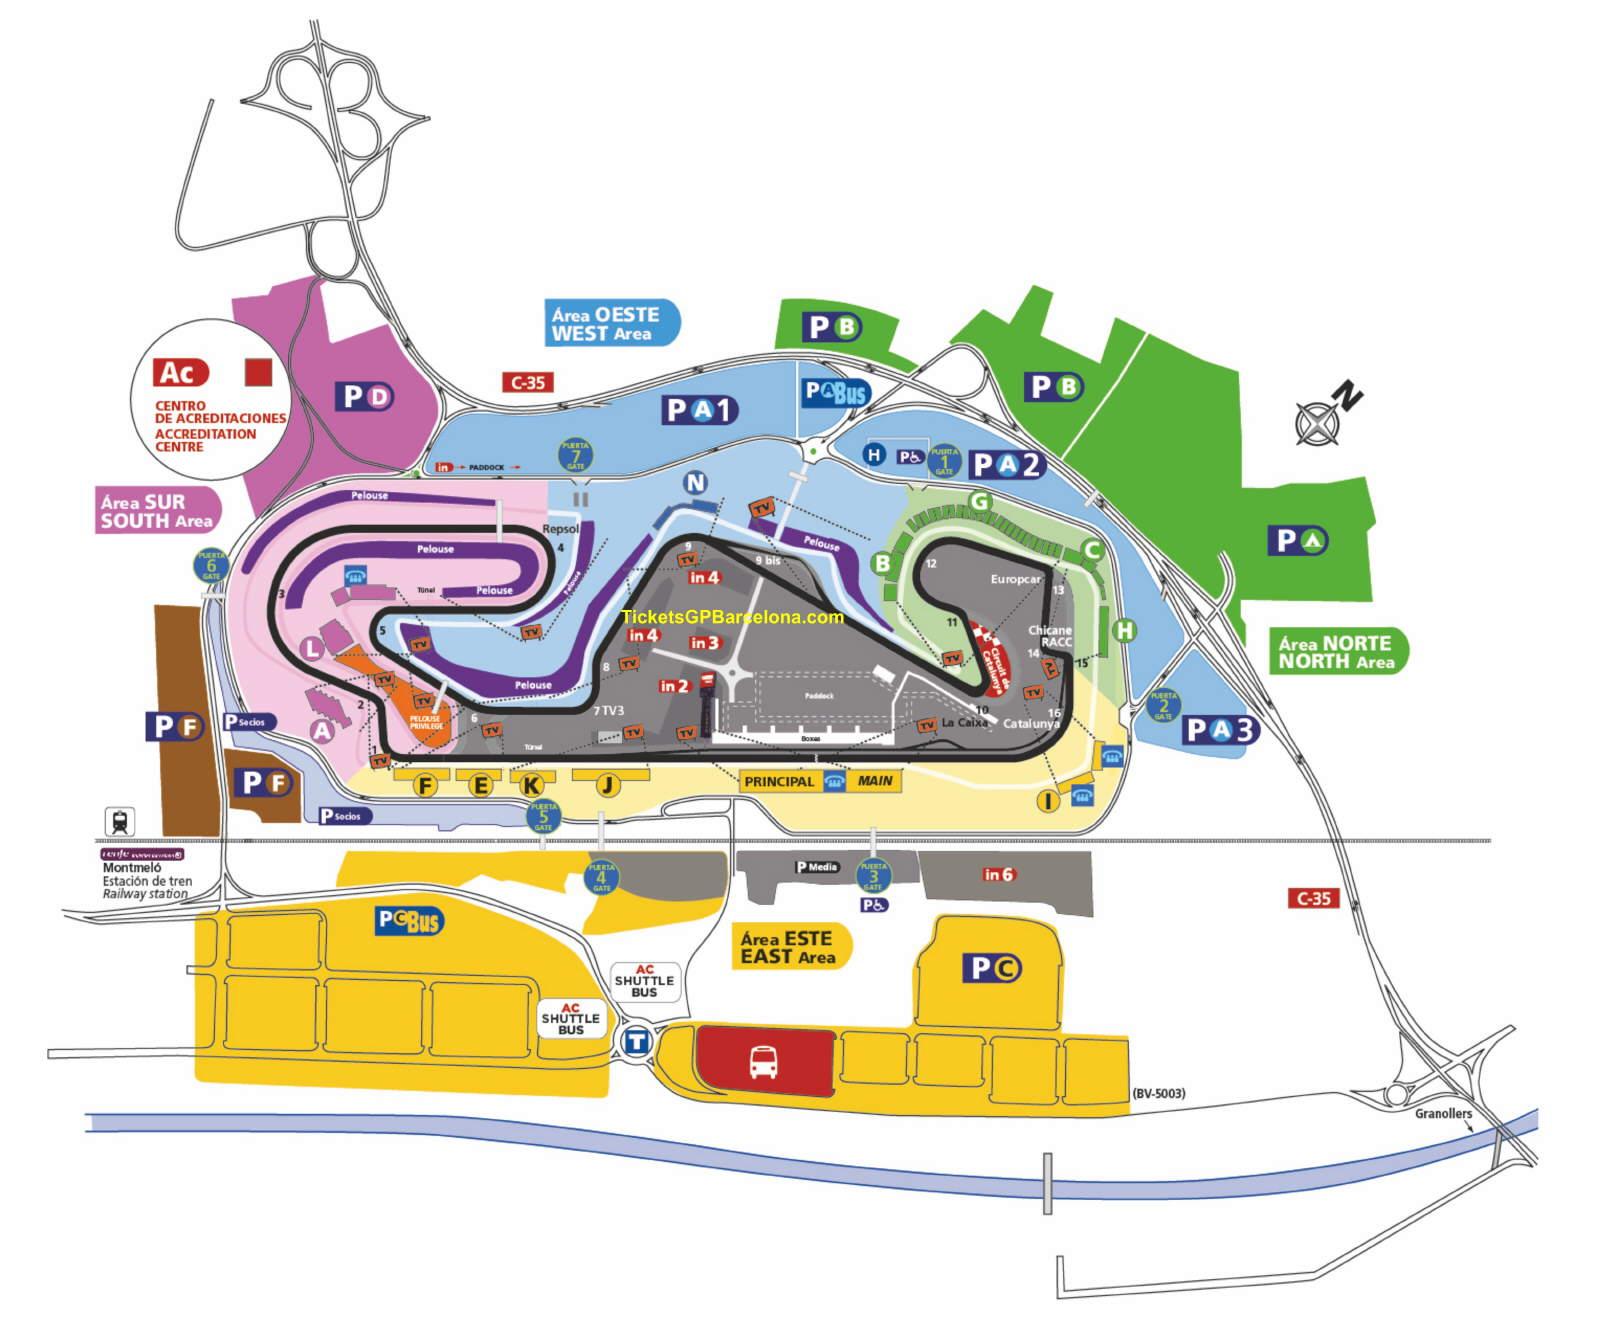 Circuit de Catalunya - Montmelo (Barcelona) - Tickets GP Barcelona